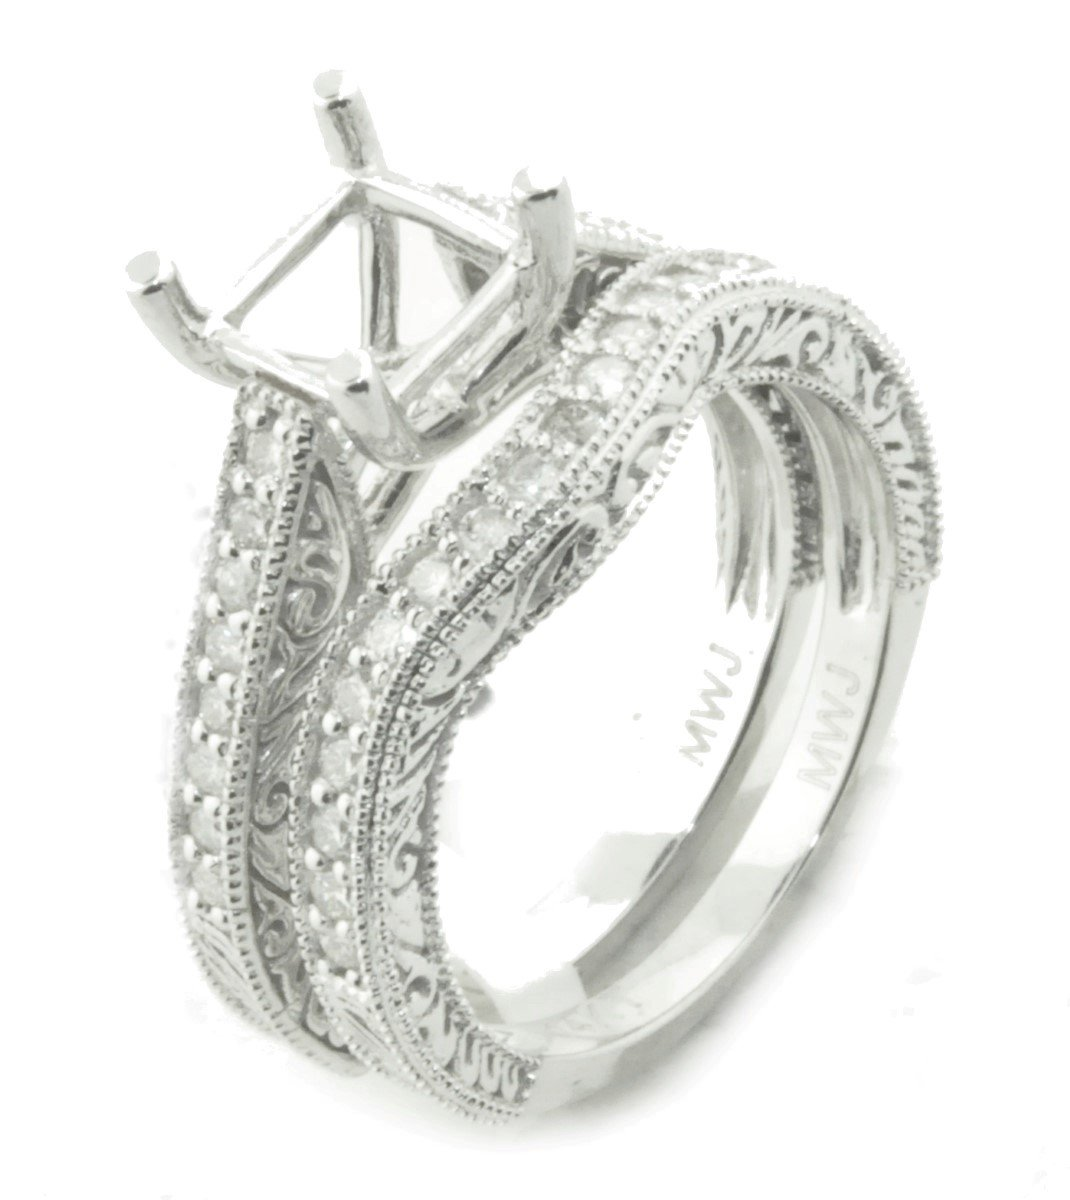 14K White Gold Semi Mount Bridal Set Rings Setting 1/2ctw Antique Style Fits 6mm Princess Center (i2/i3, i/j)